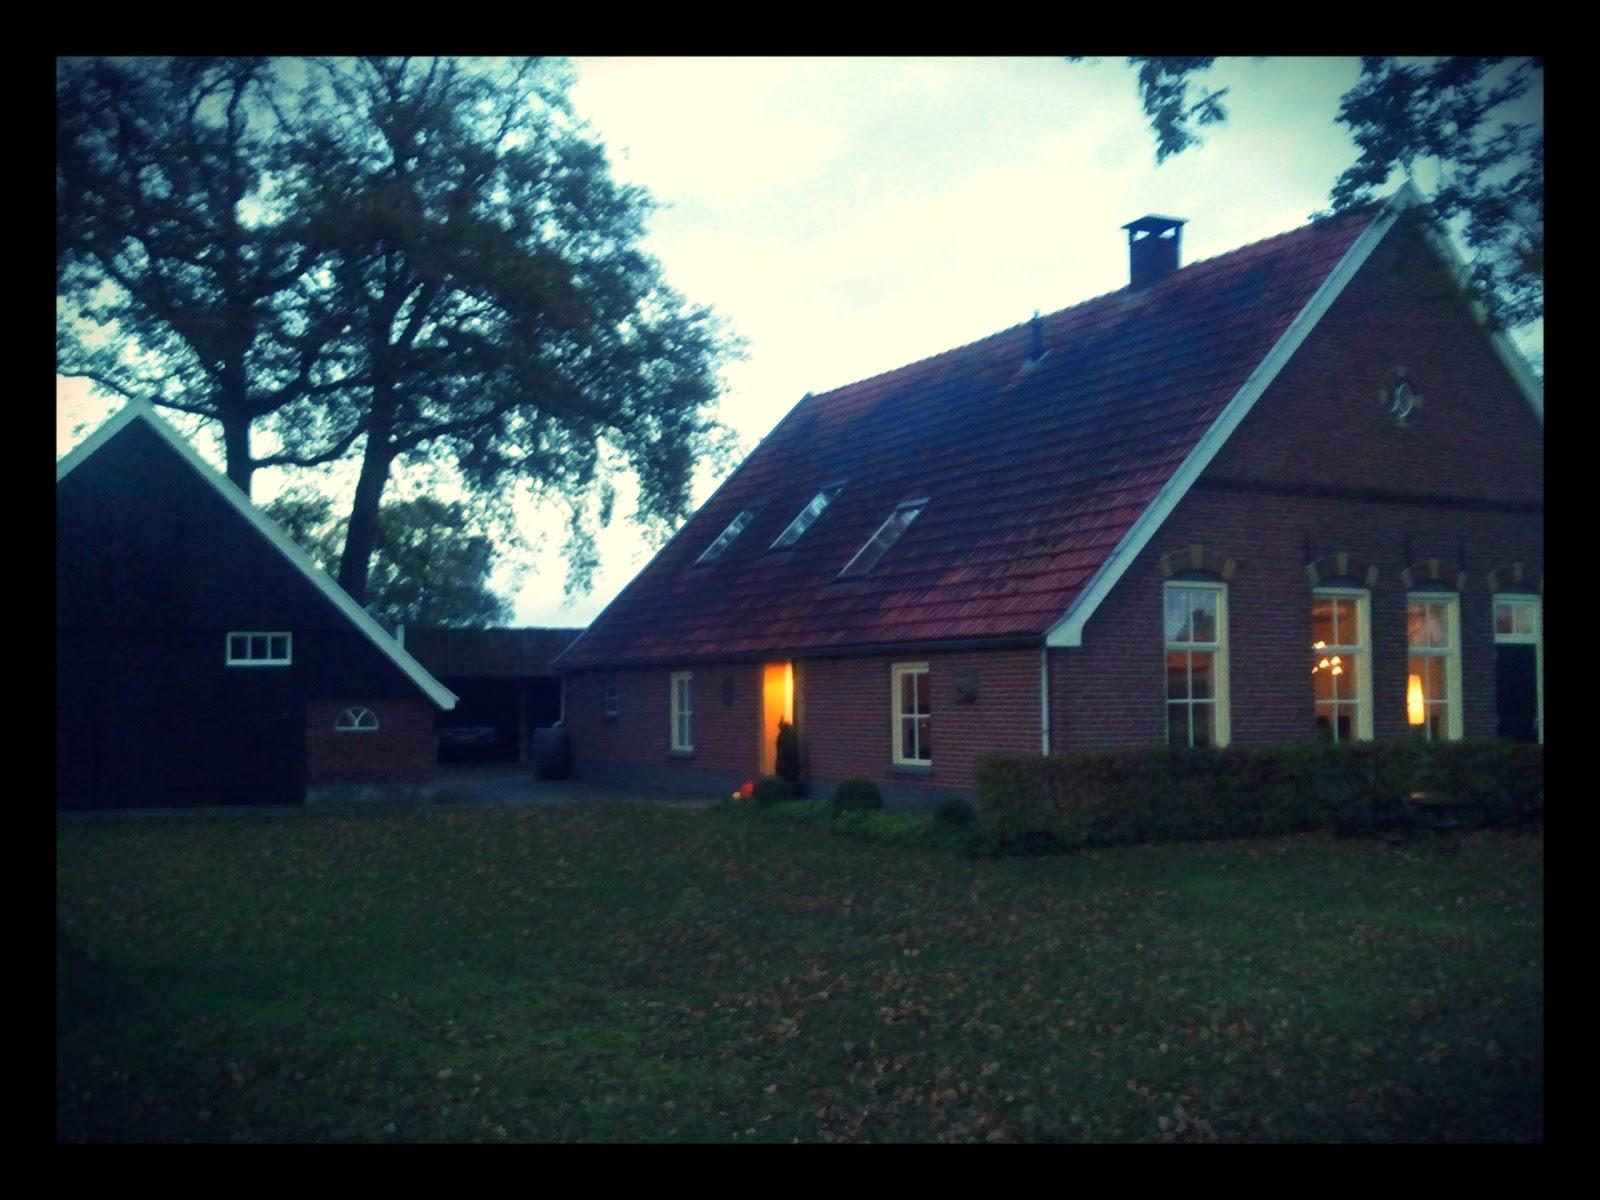 Welkom in Haaksbergen!